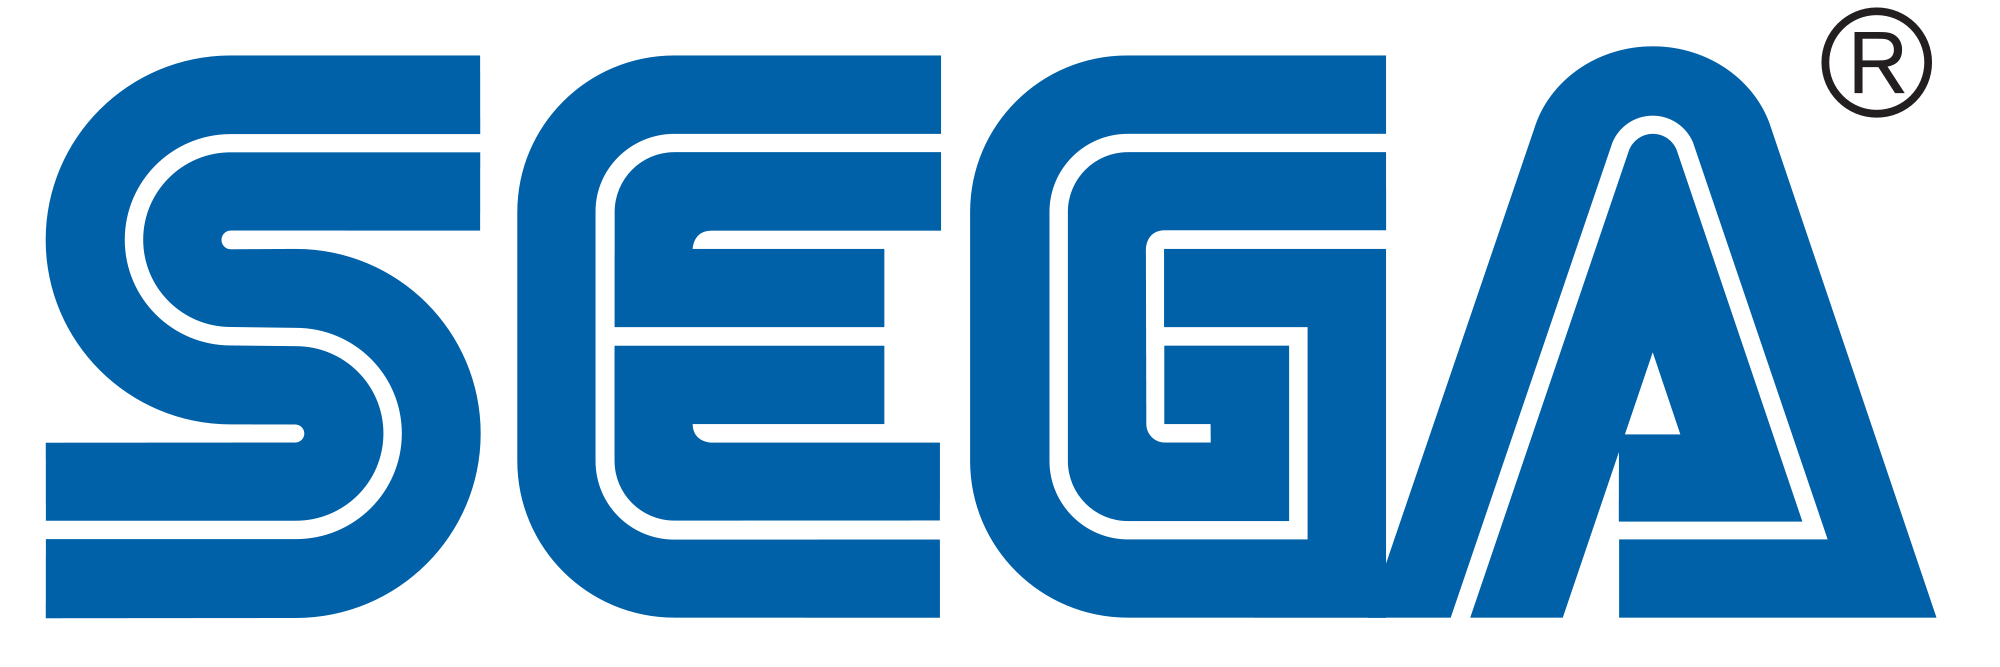 File:SEGA logo.png